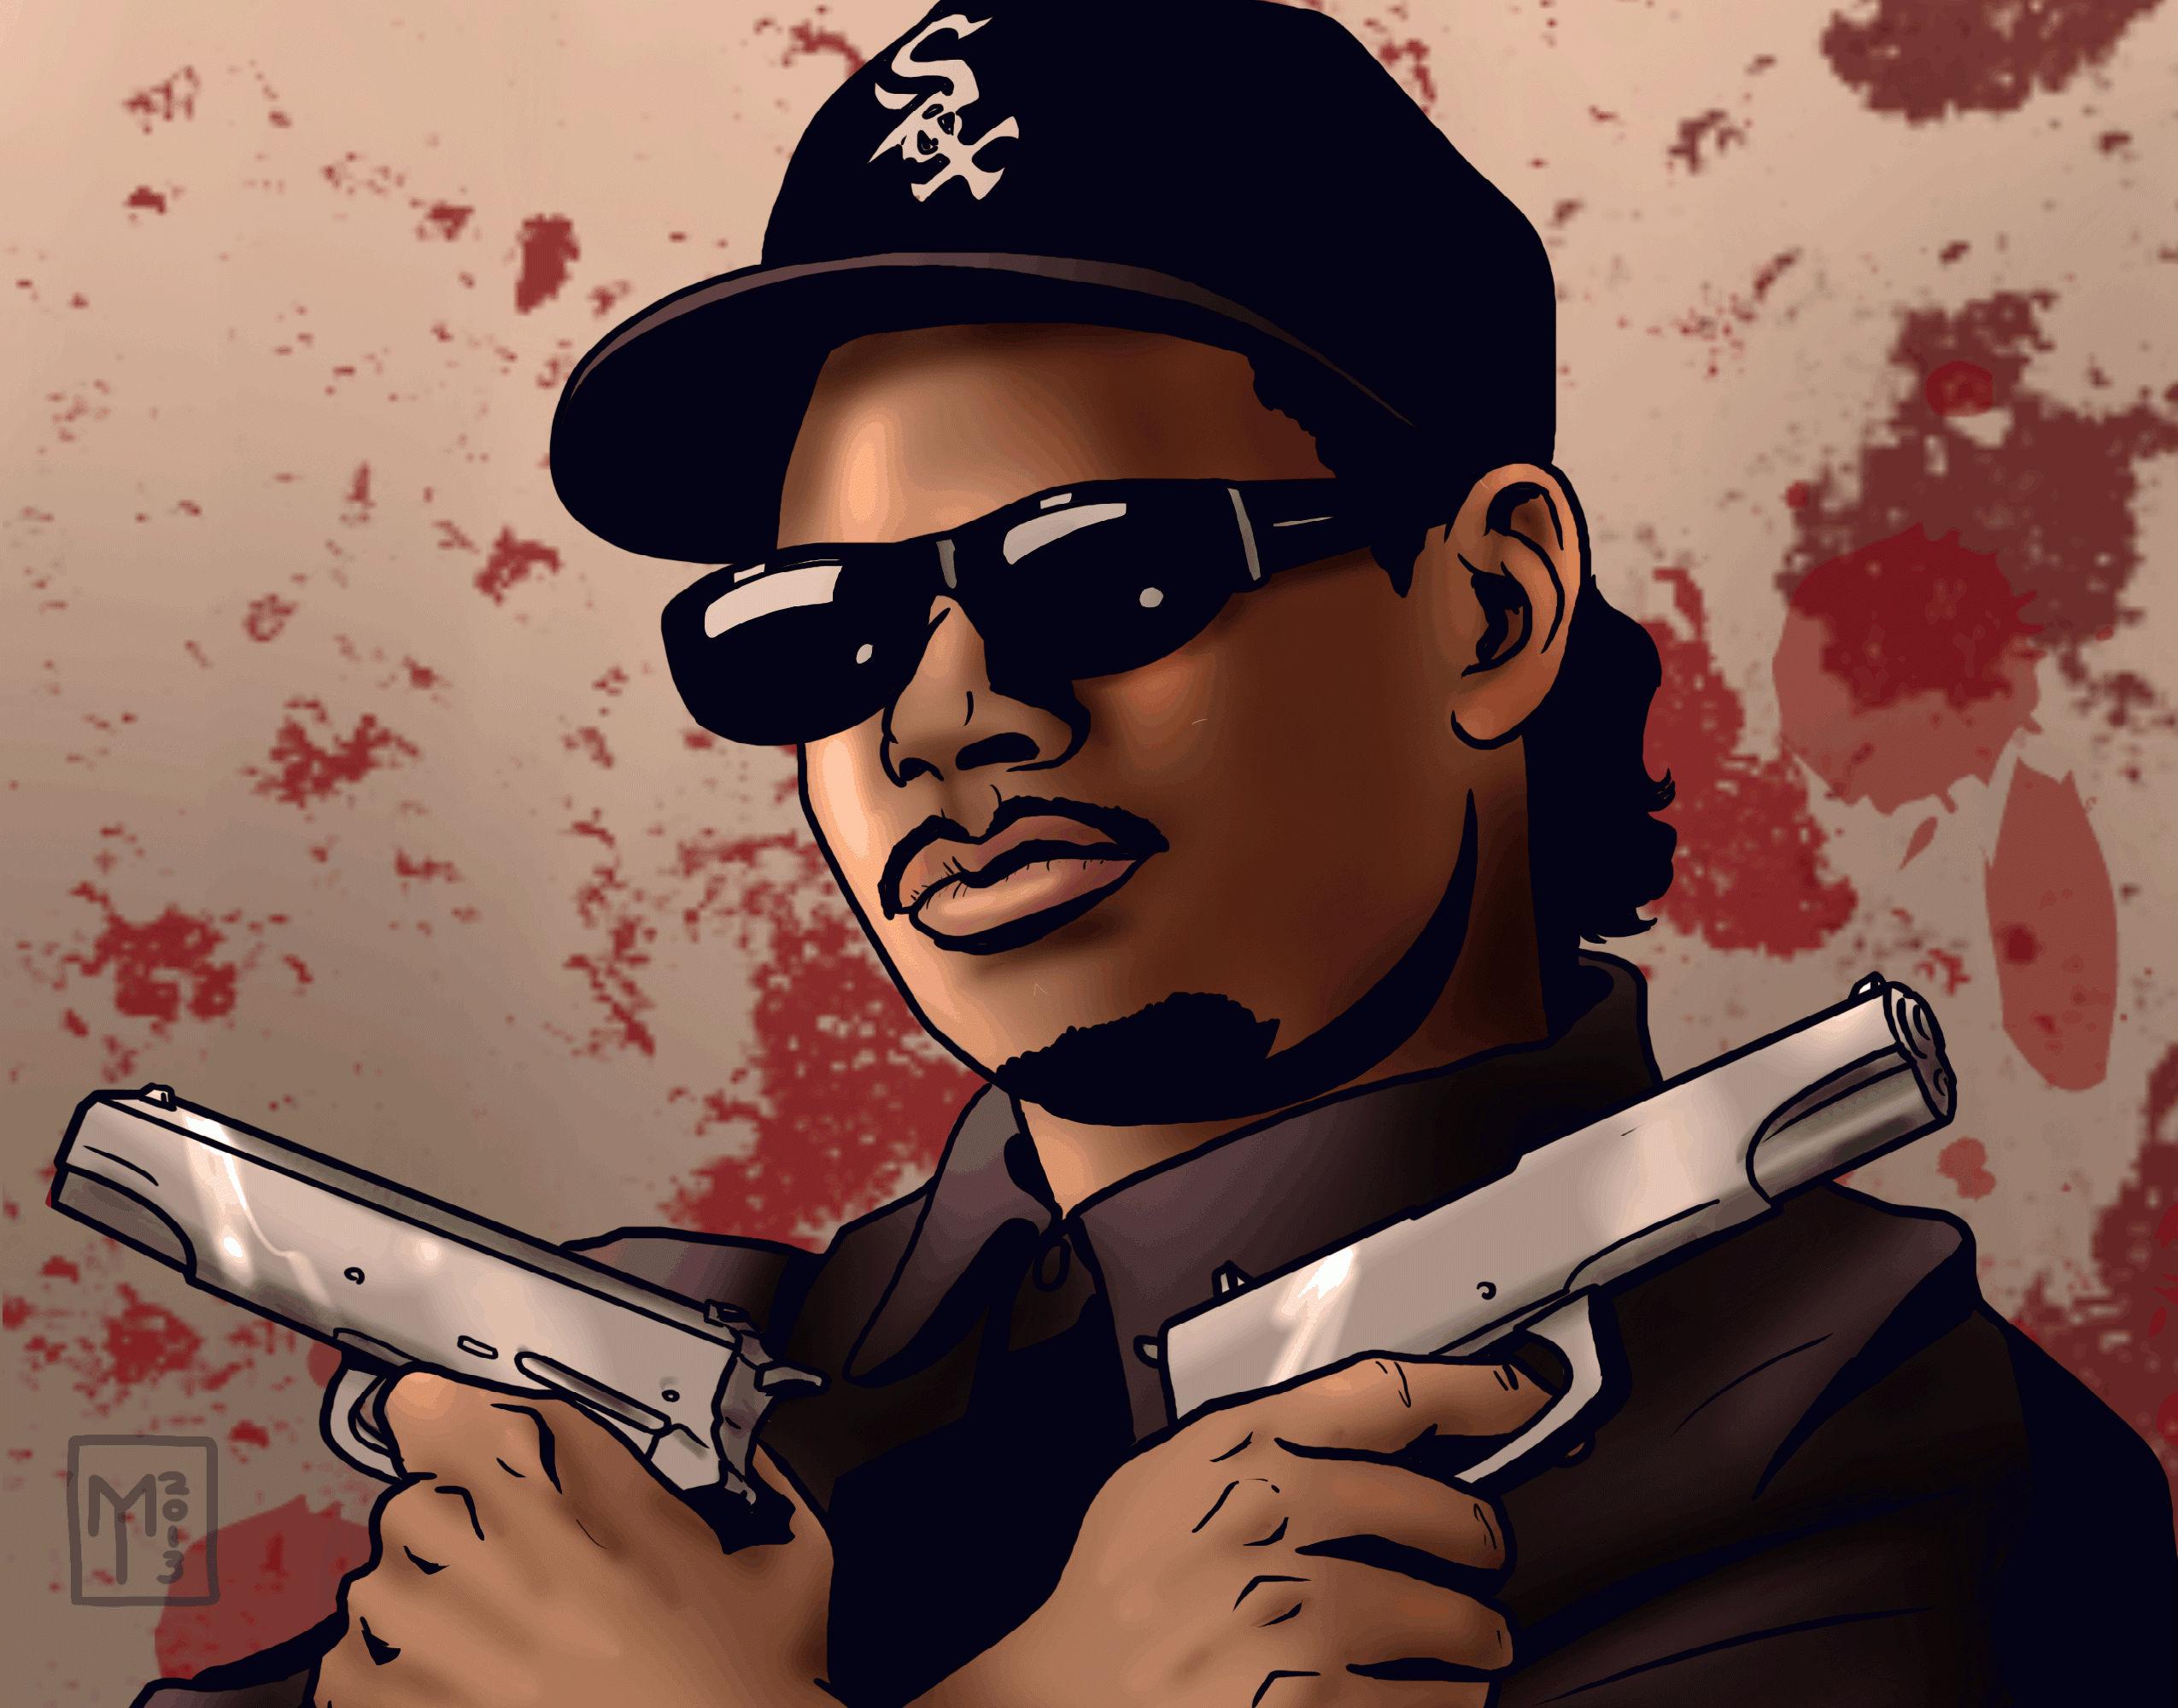 Eazy E Cartoon: NWA IPhone Wallpaper